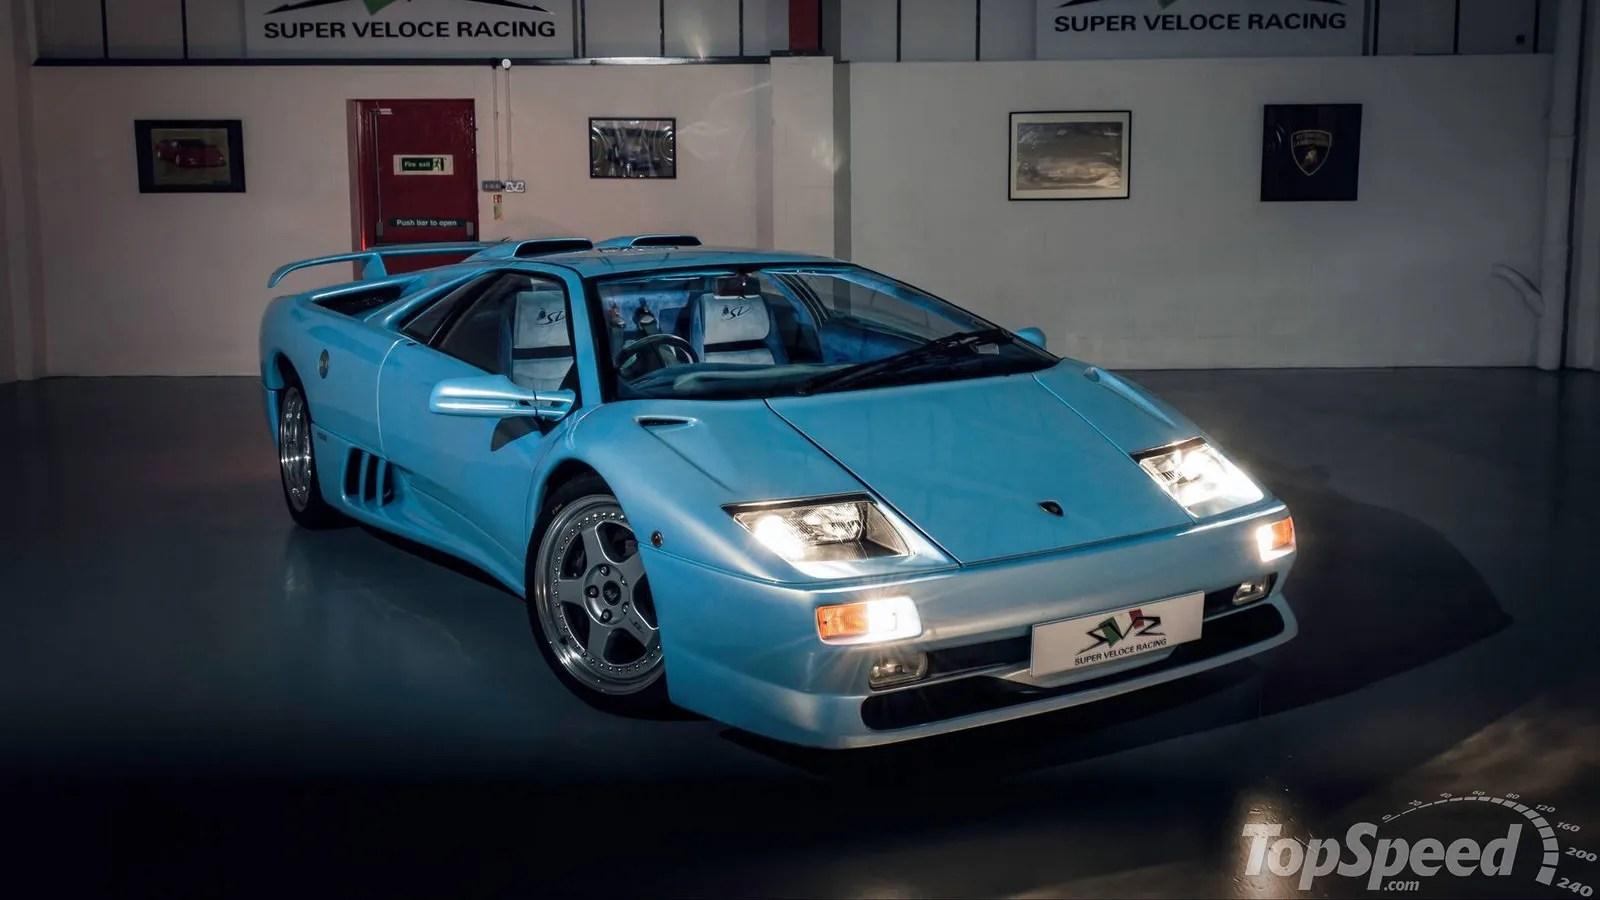 1995 Lamborghini Diablo Sv By Super Veloce Racing Top Speed